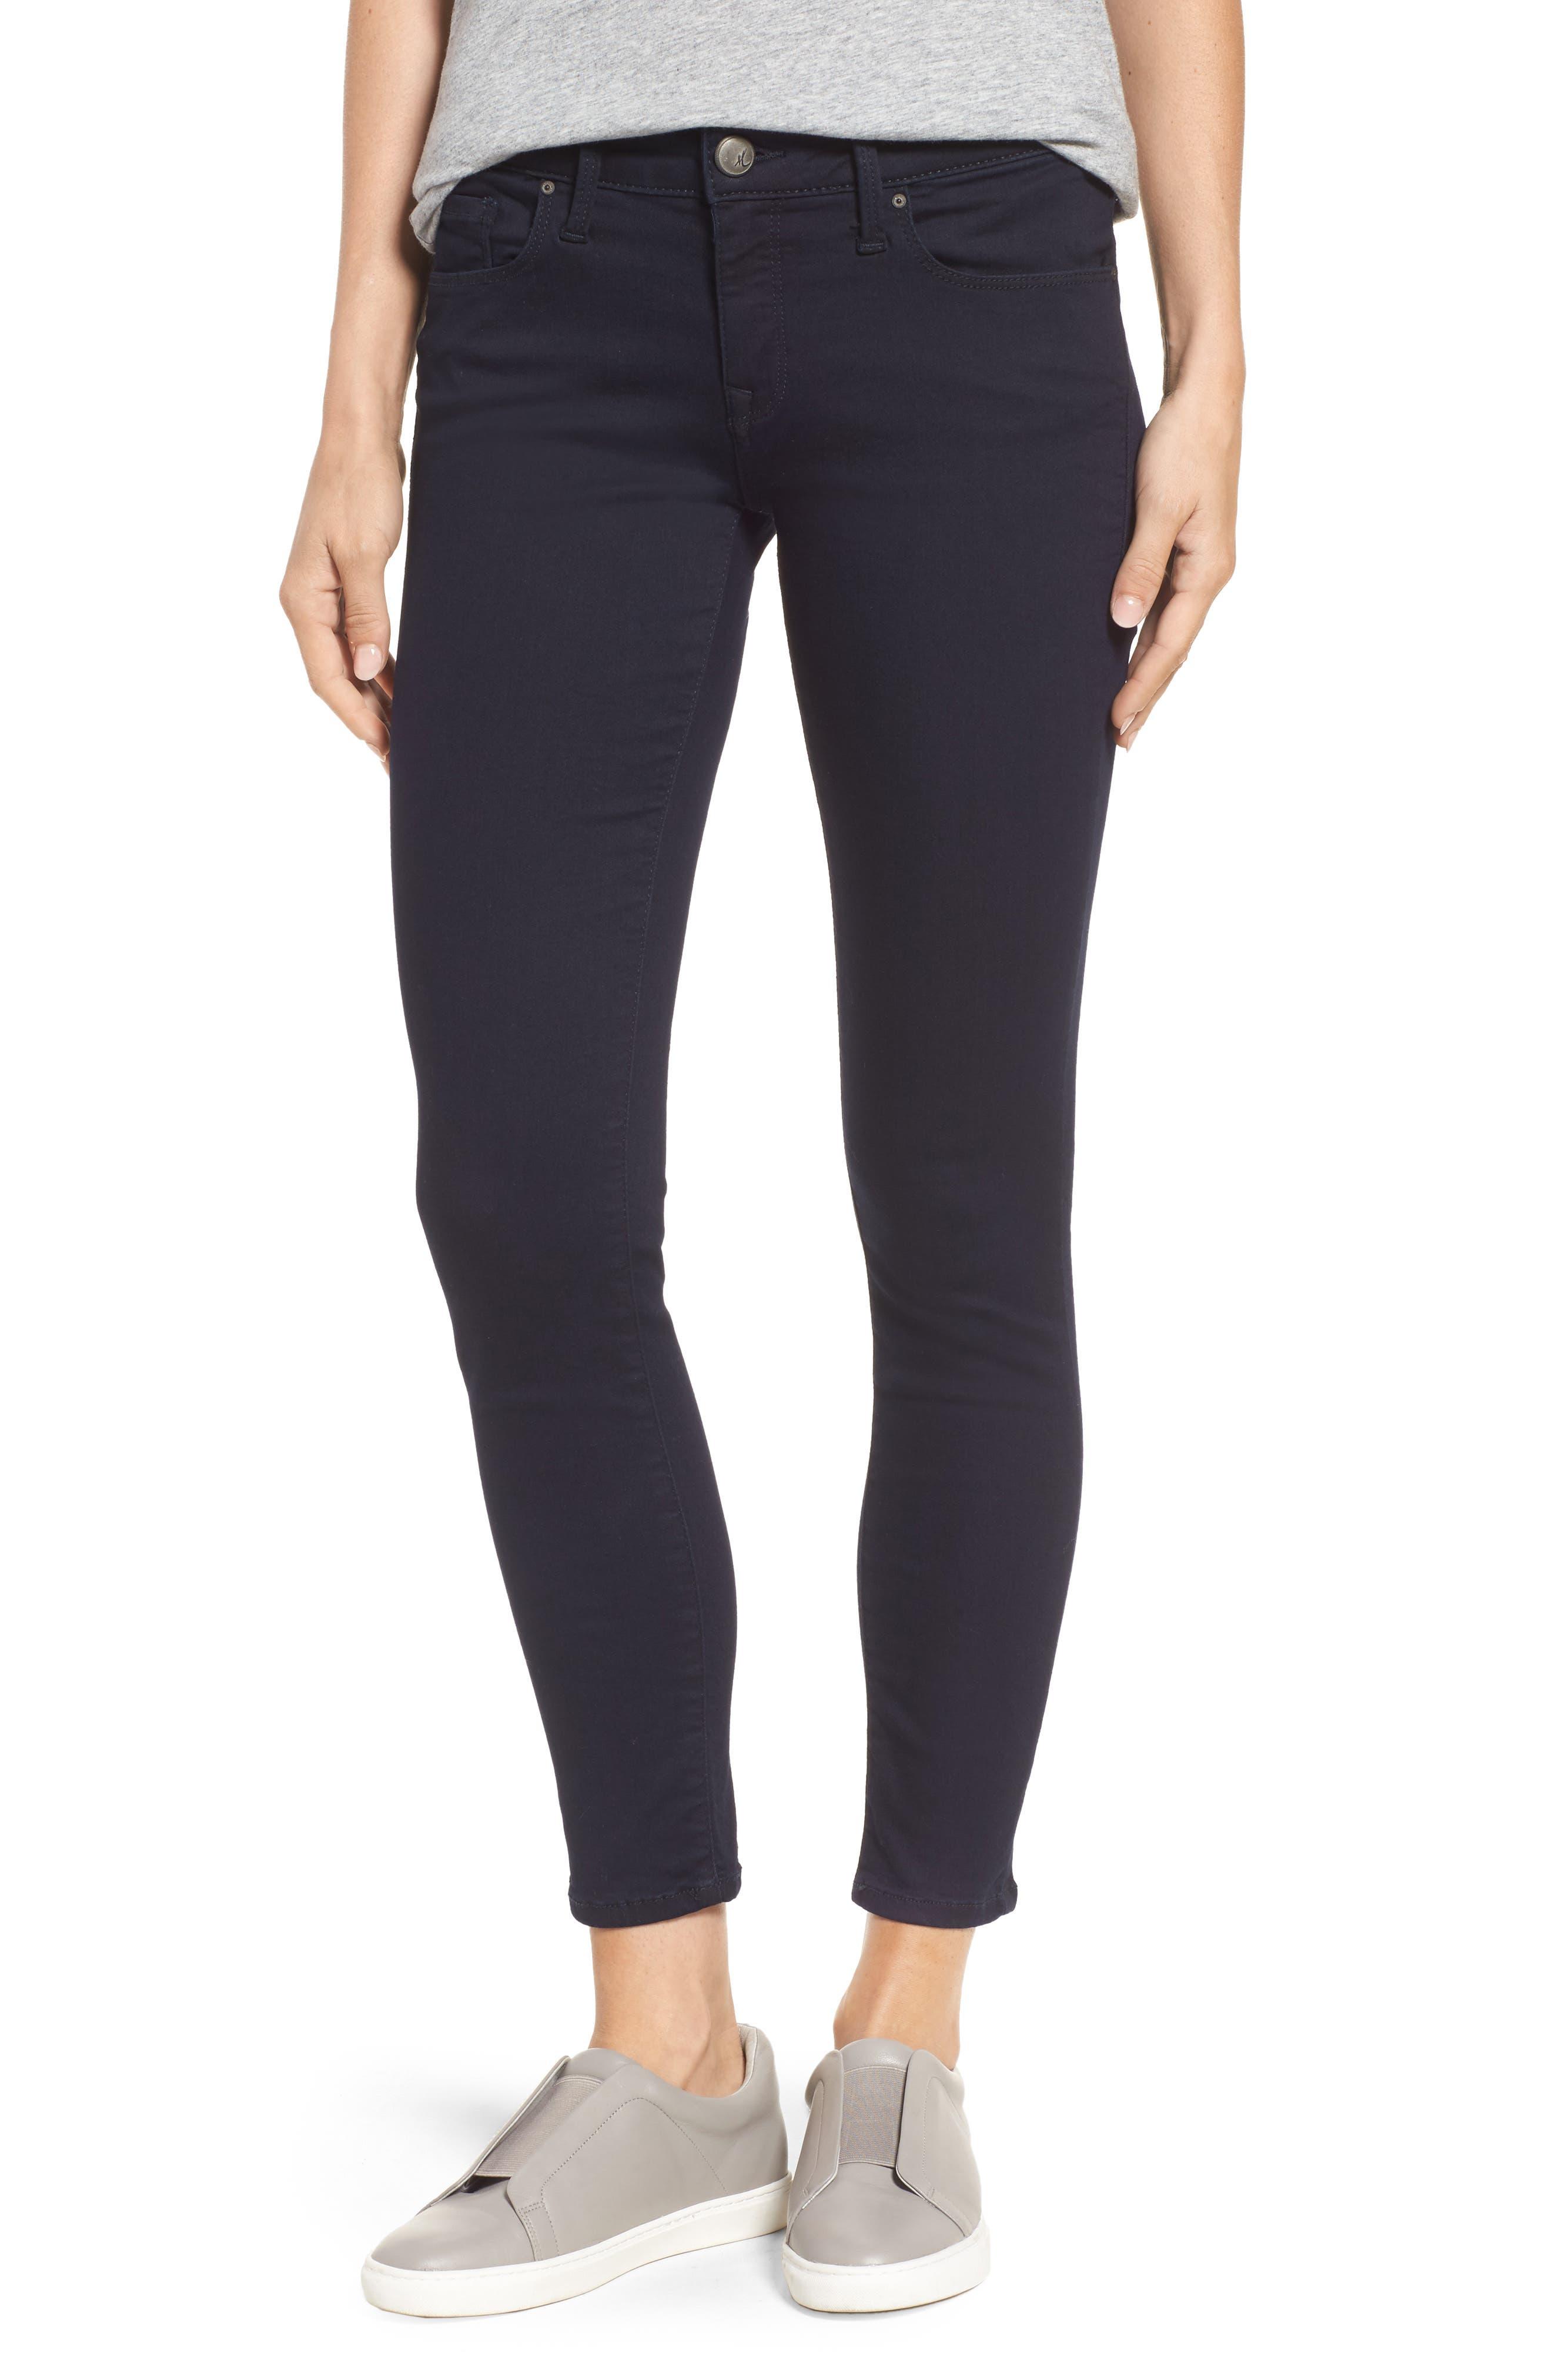 Alternate Image 1 Selected - Mavi Jeans 'Alexa' Midrise Skinny Jeans (Dark Shanty)